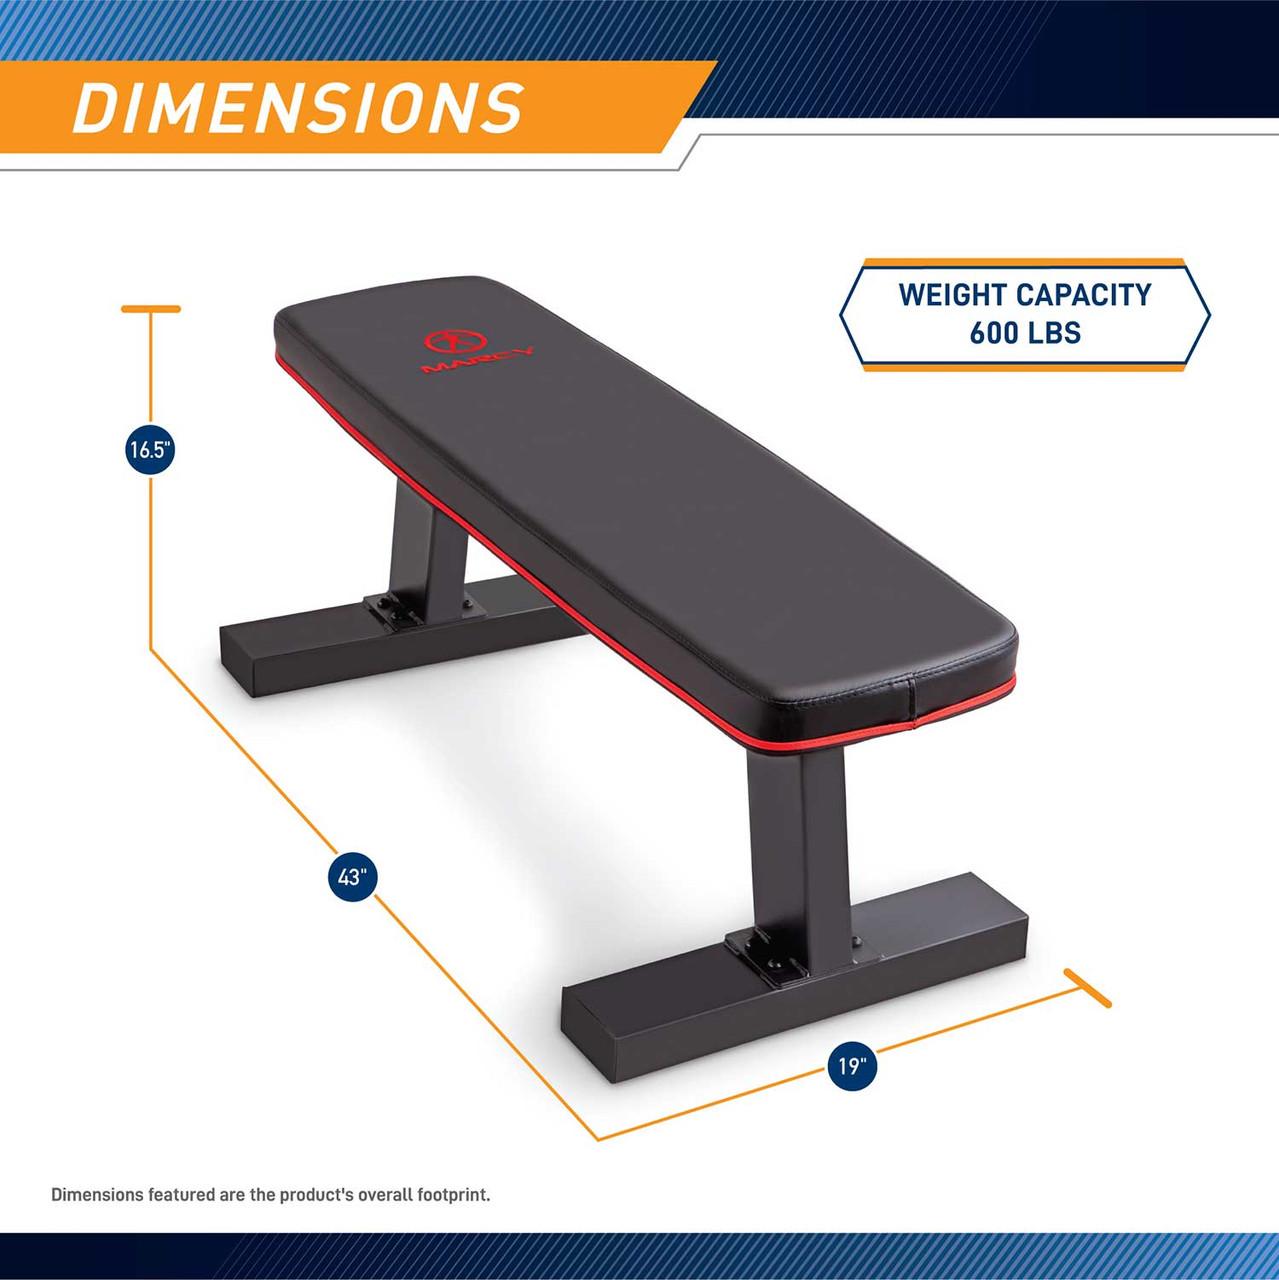 The Marcy SB-10510 Flat Bench has a sturdy foundation